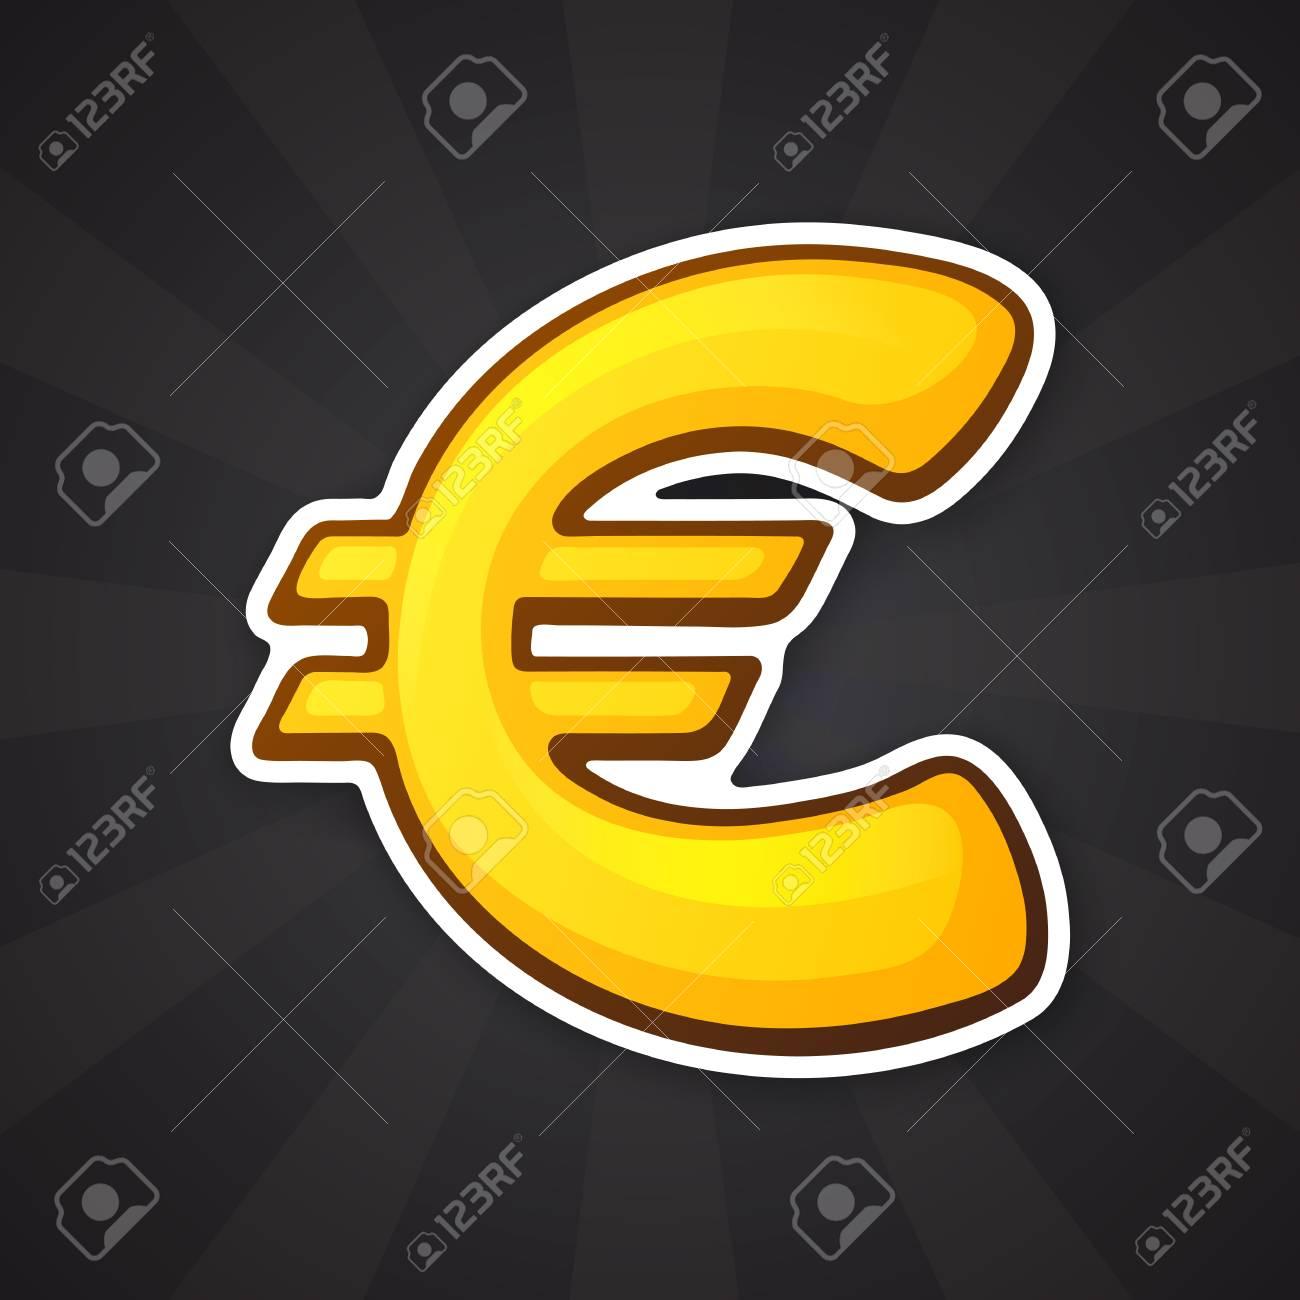 Vector Illustration Golden Euro Sign The Symbol Of World